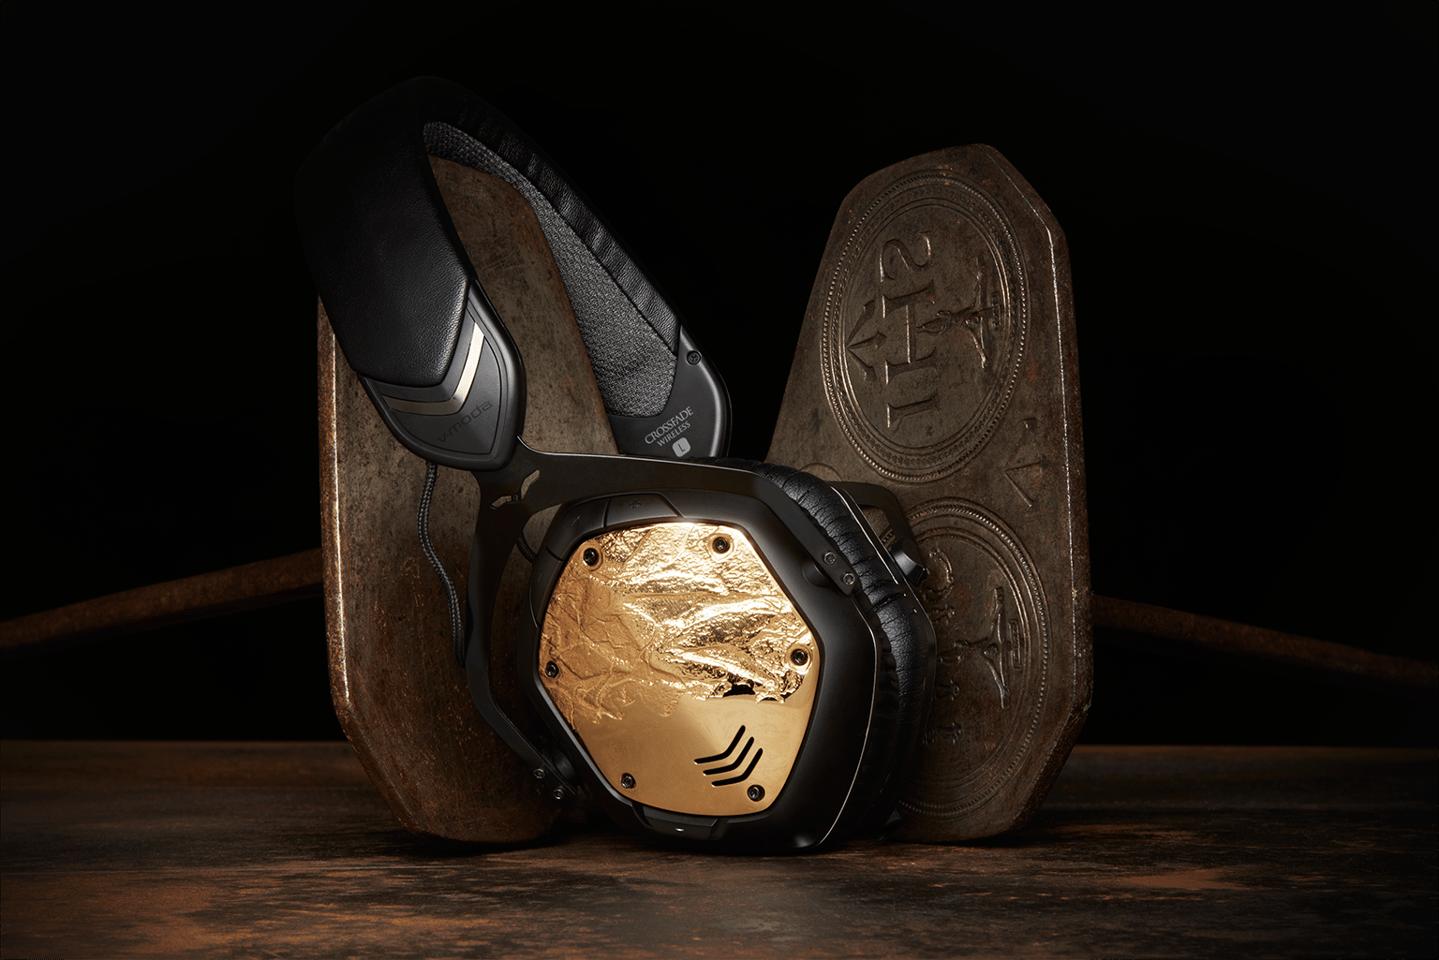 V-Moda's Crossfade Wireless headphones in gunmetal with 3D-printed shields